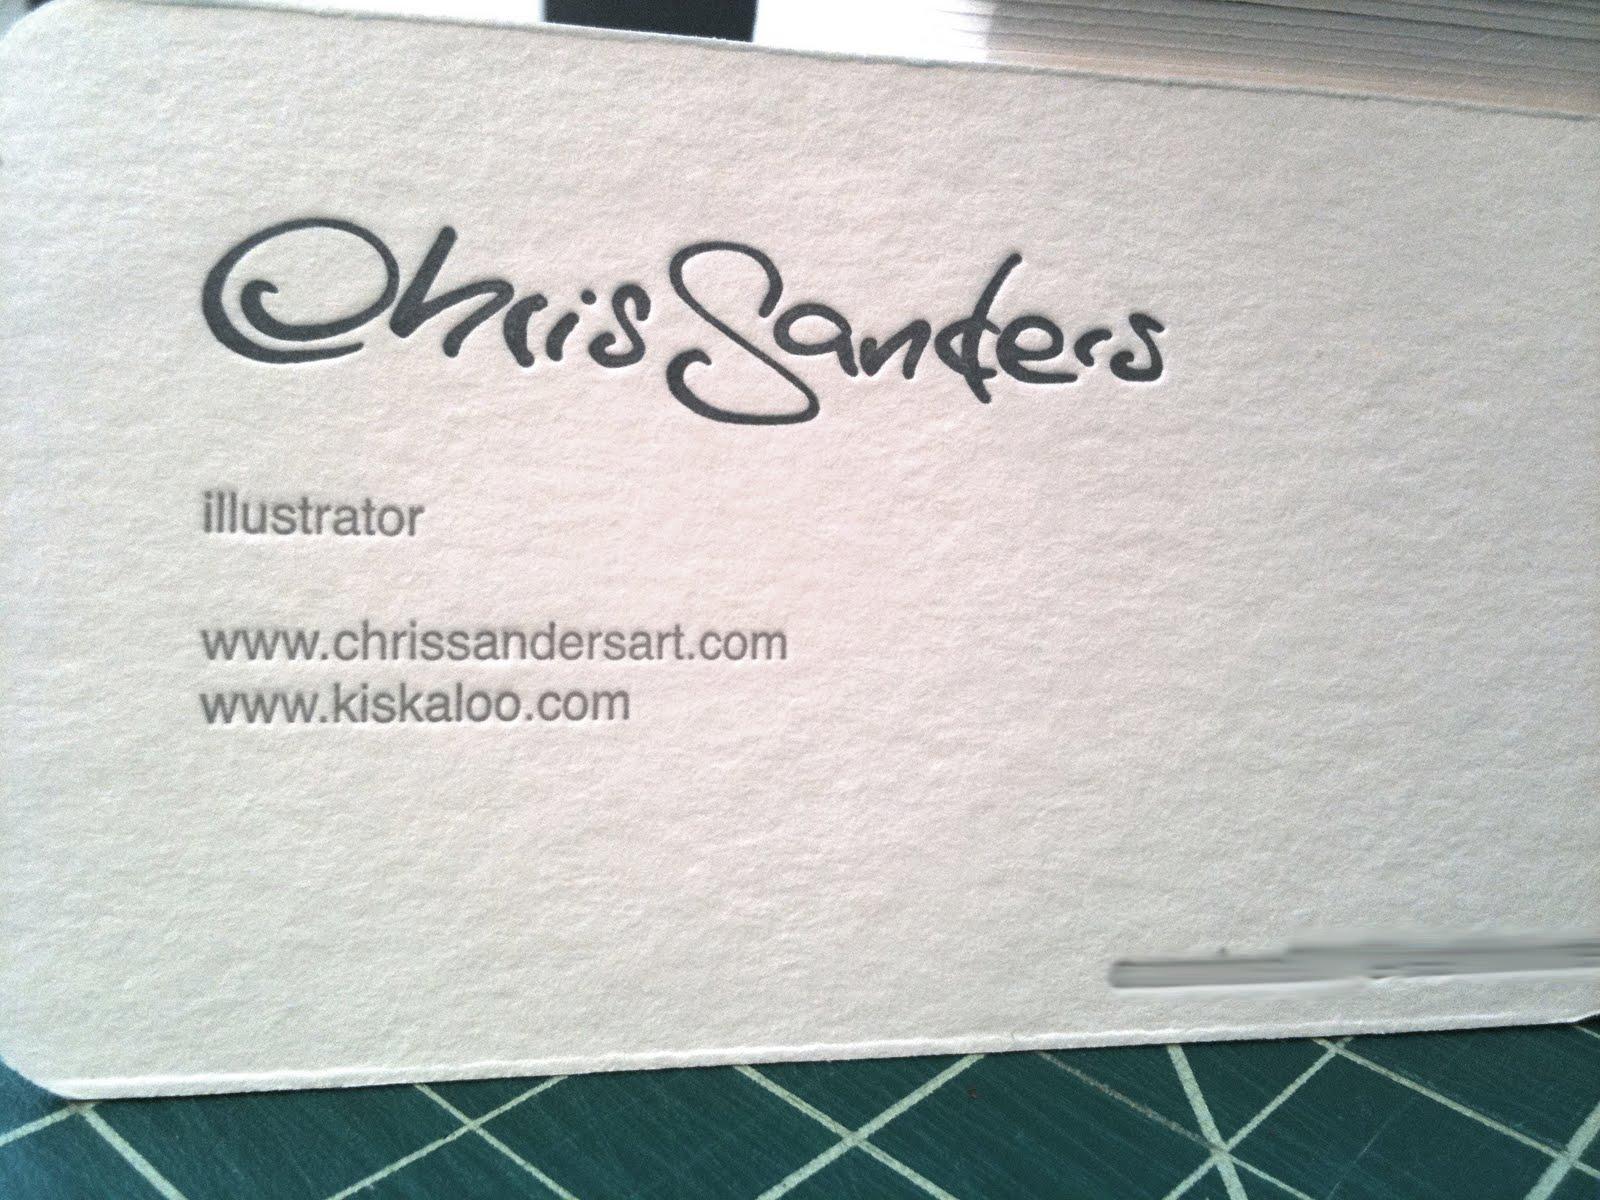 mandy sechrist\'s blog: A Chris Sanders business card